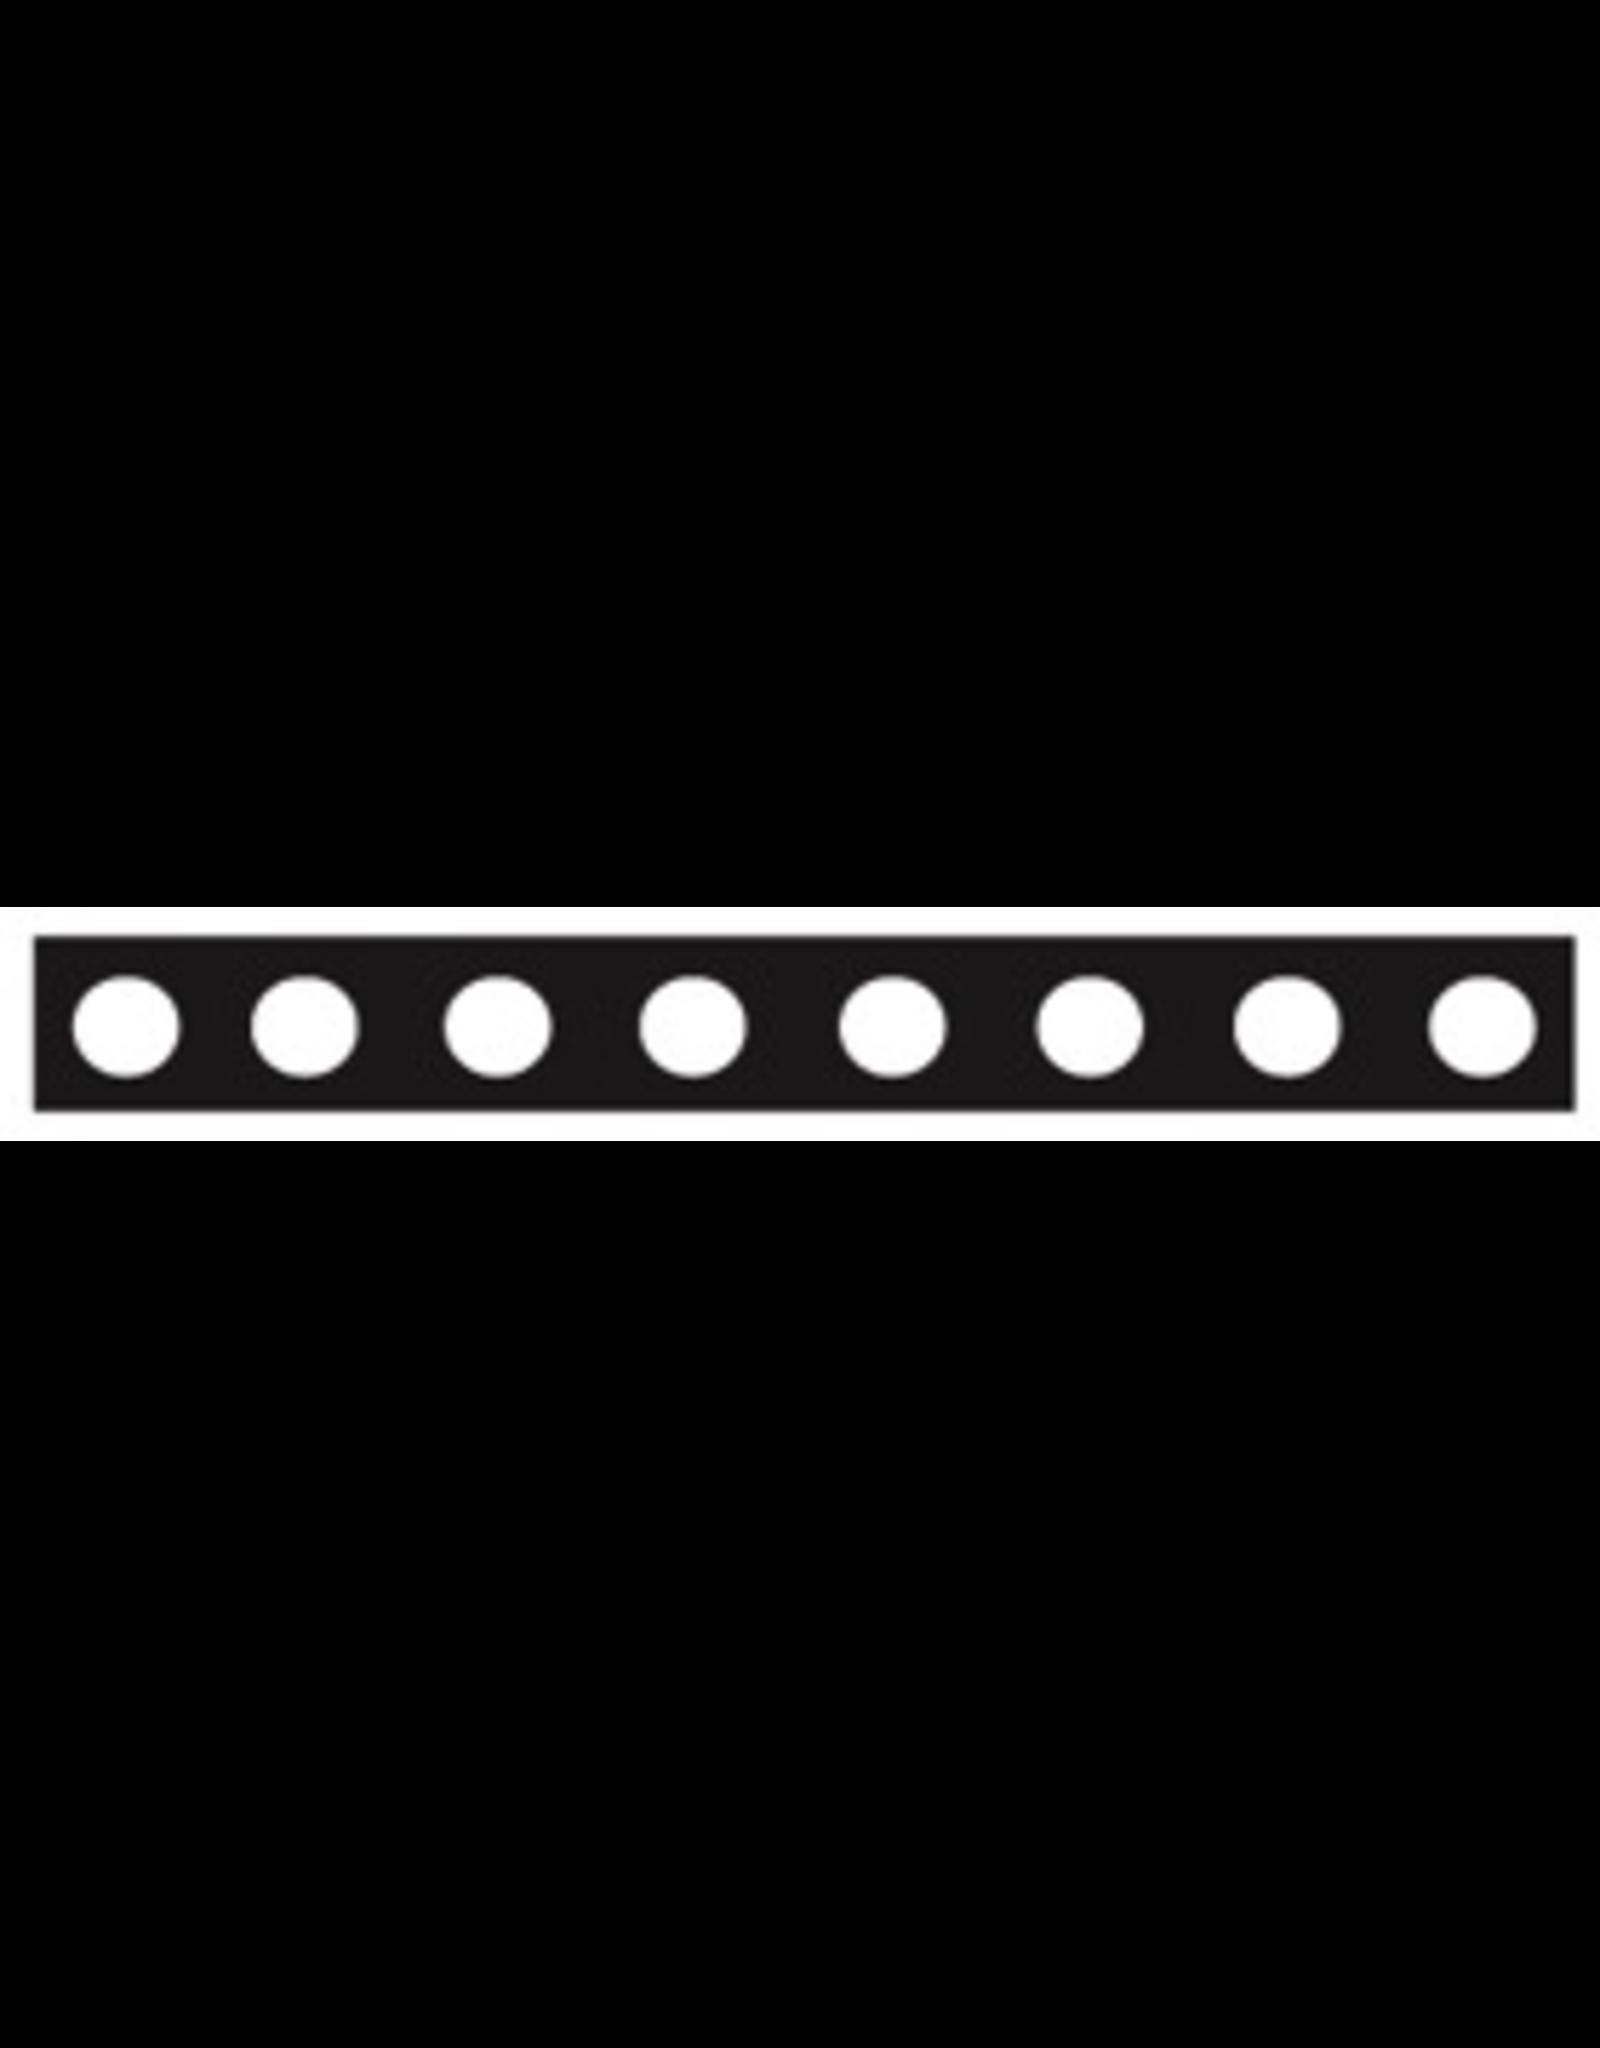 MKM tools Impressed dots pattern roller